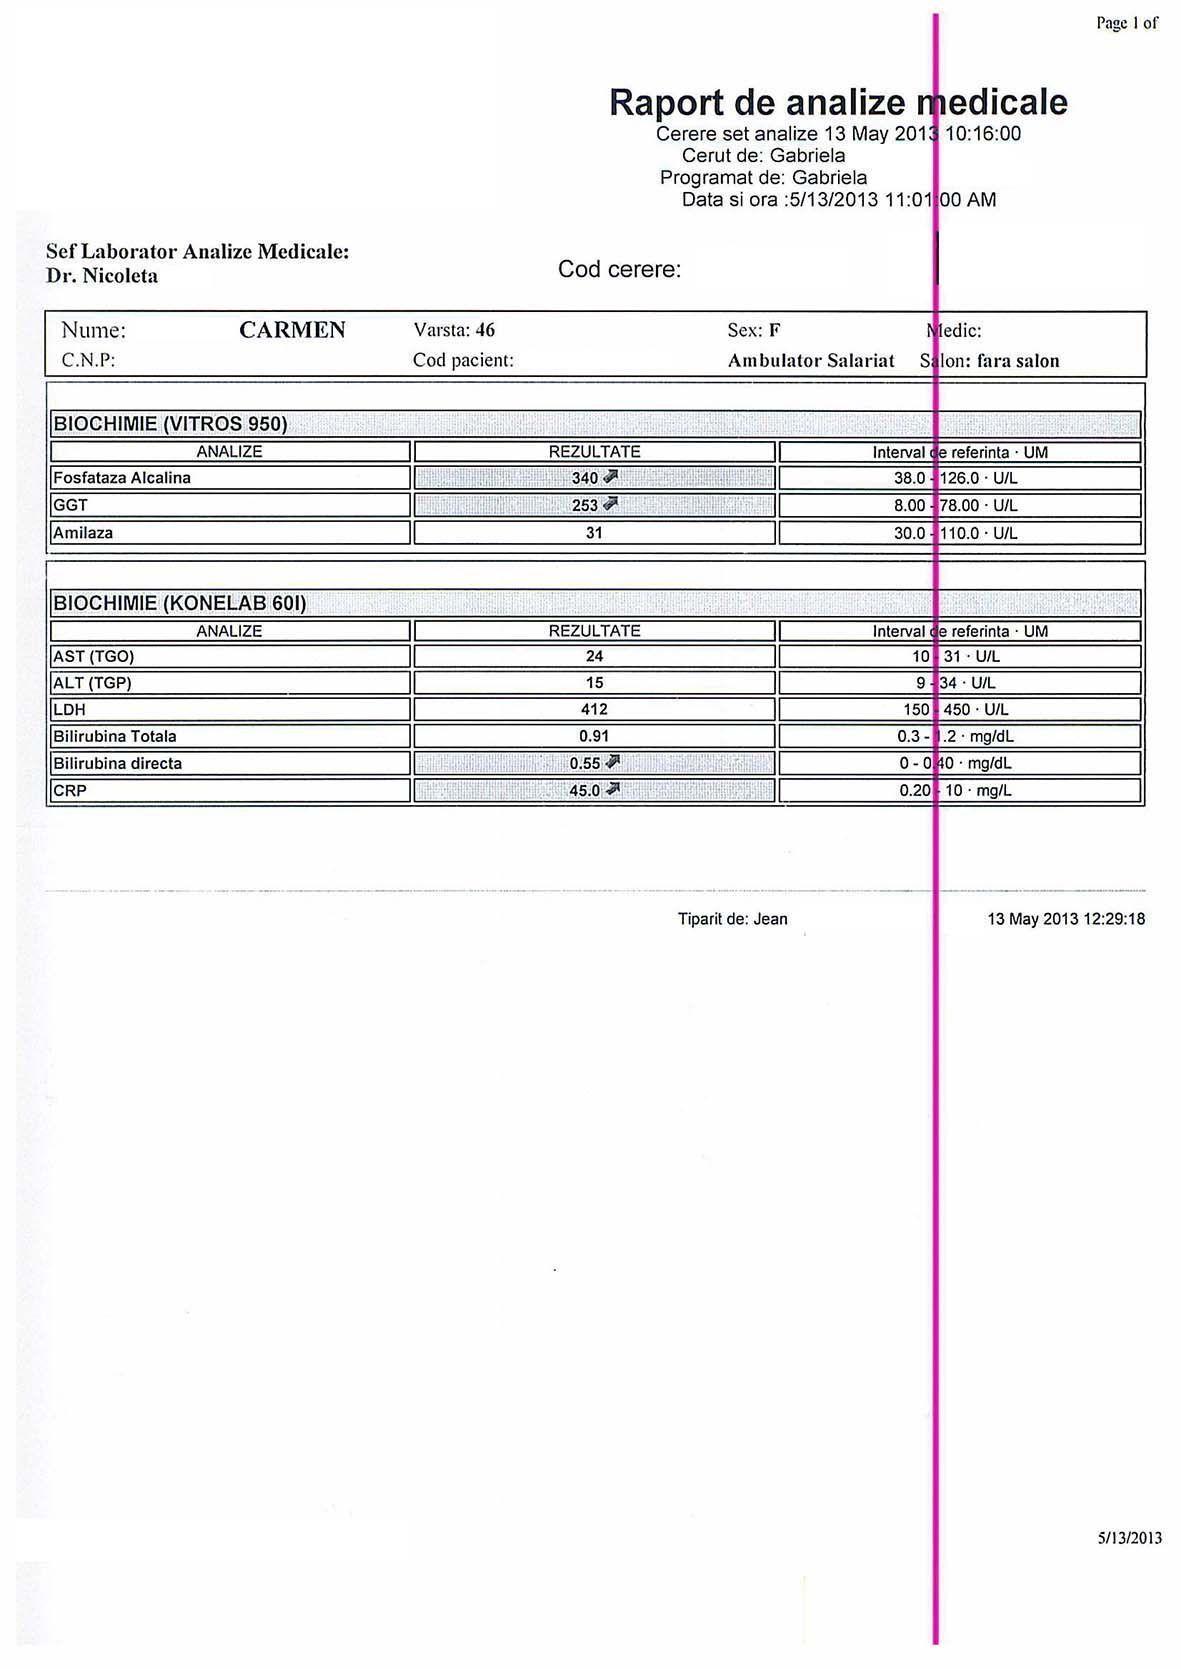 LifEscozul® - Carmen 3 - Cáncer de Hígado